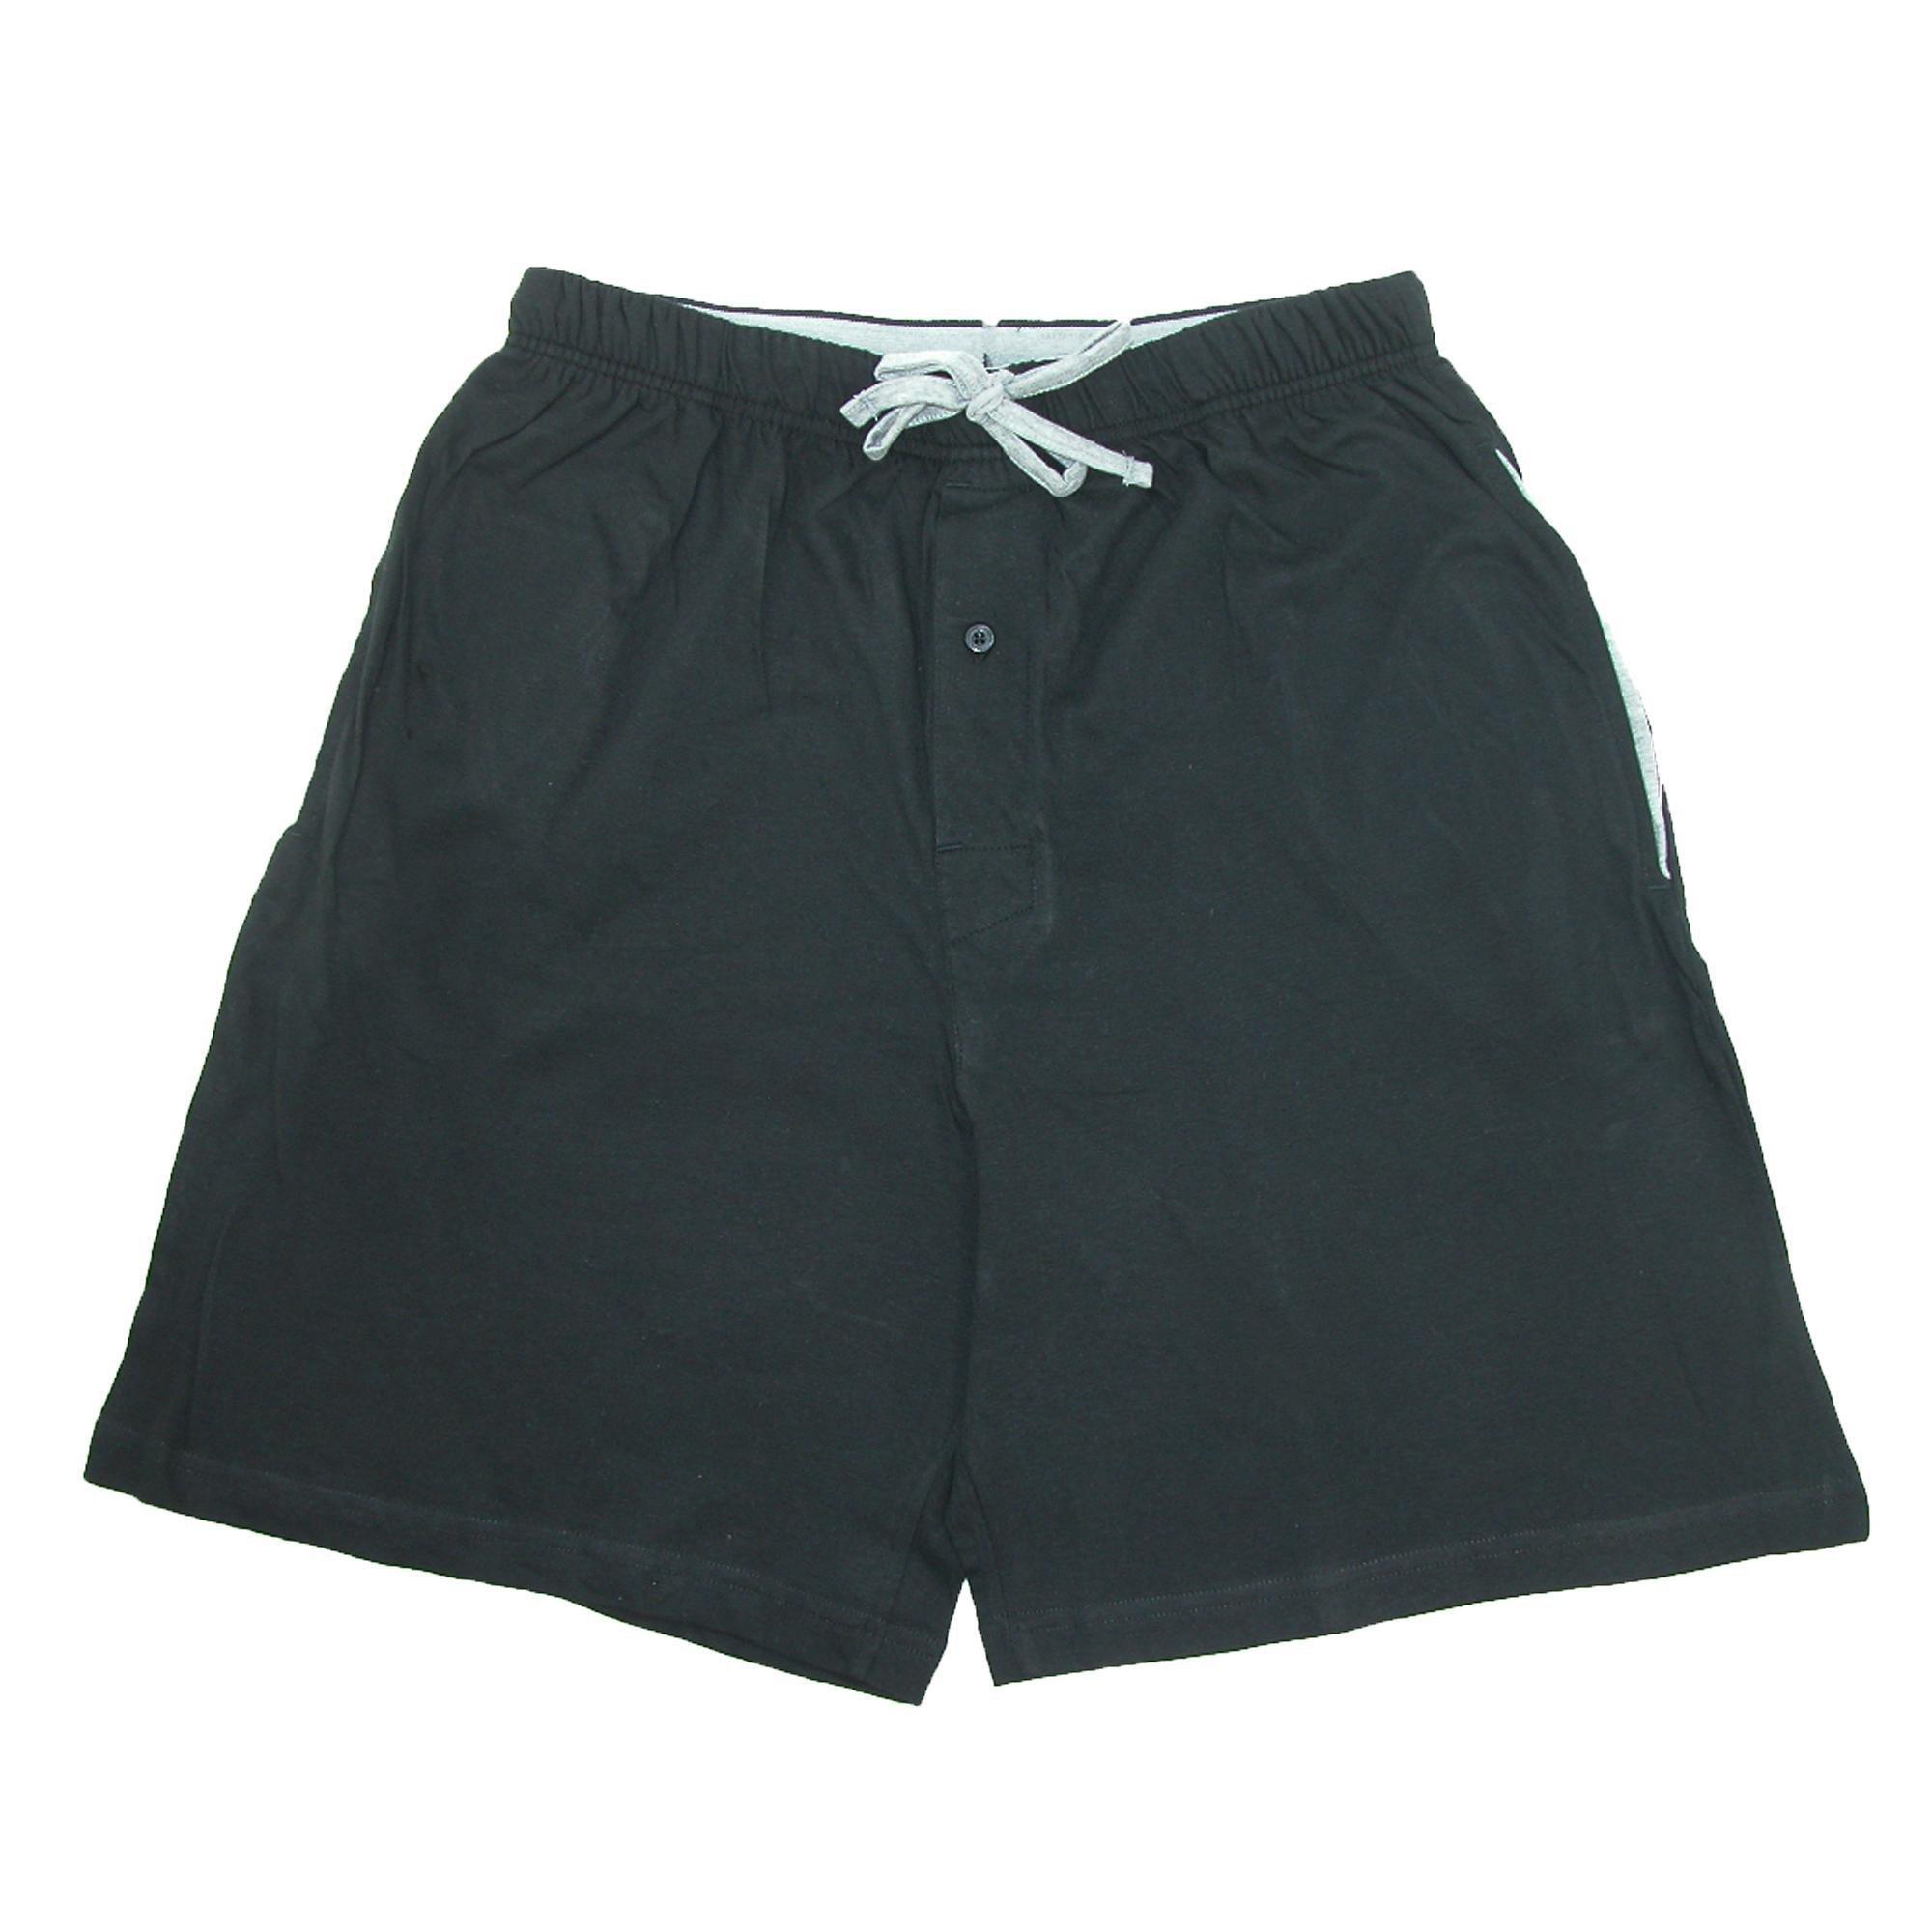 Hanes Men's Jersey Knit Cotton Button Fly Pajama Sleep Shorts, Large, Black